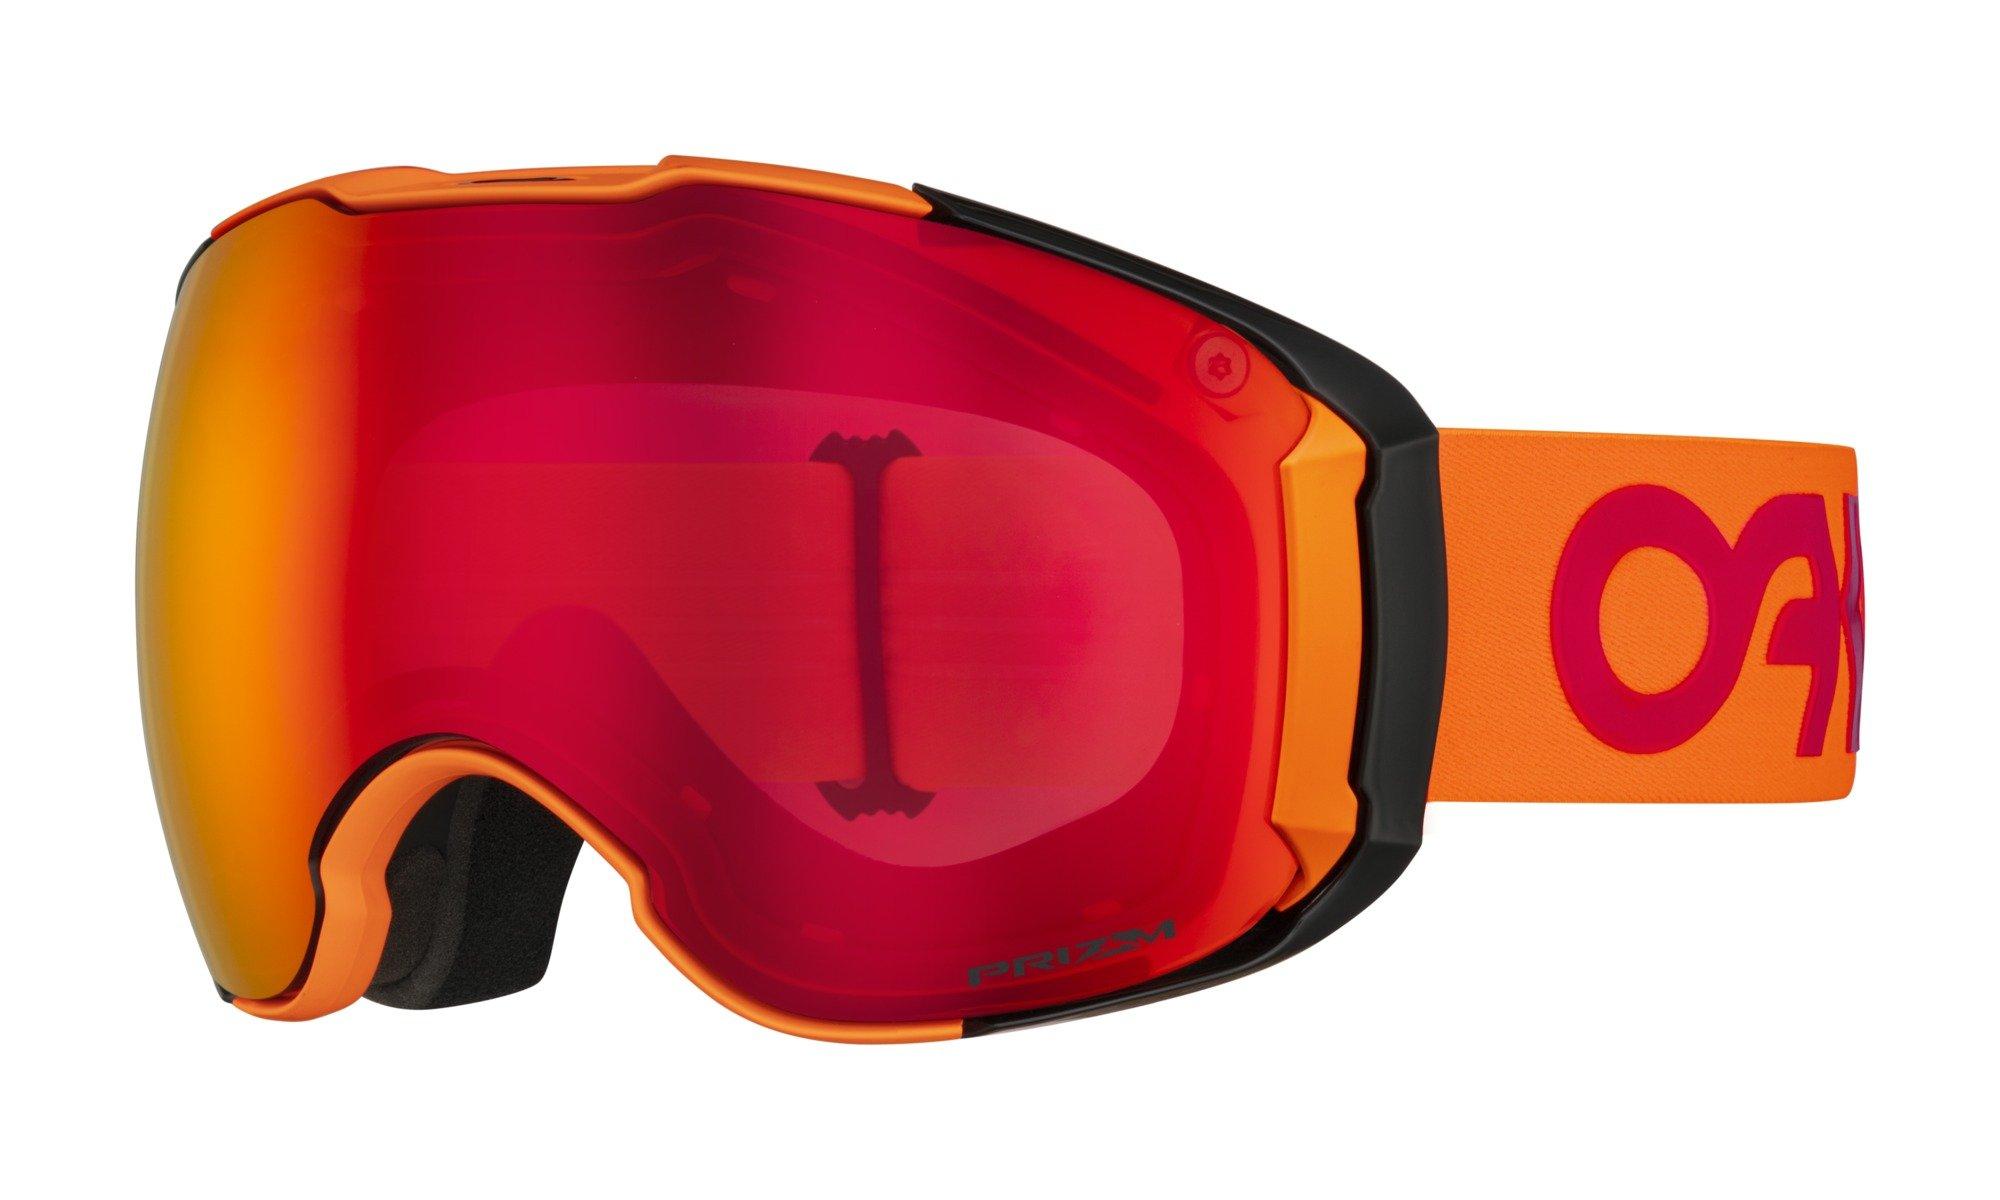 2020 Oakley Airbrake XL Snow Goggle